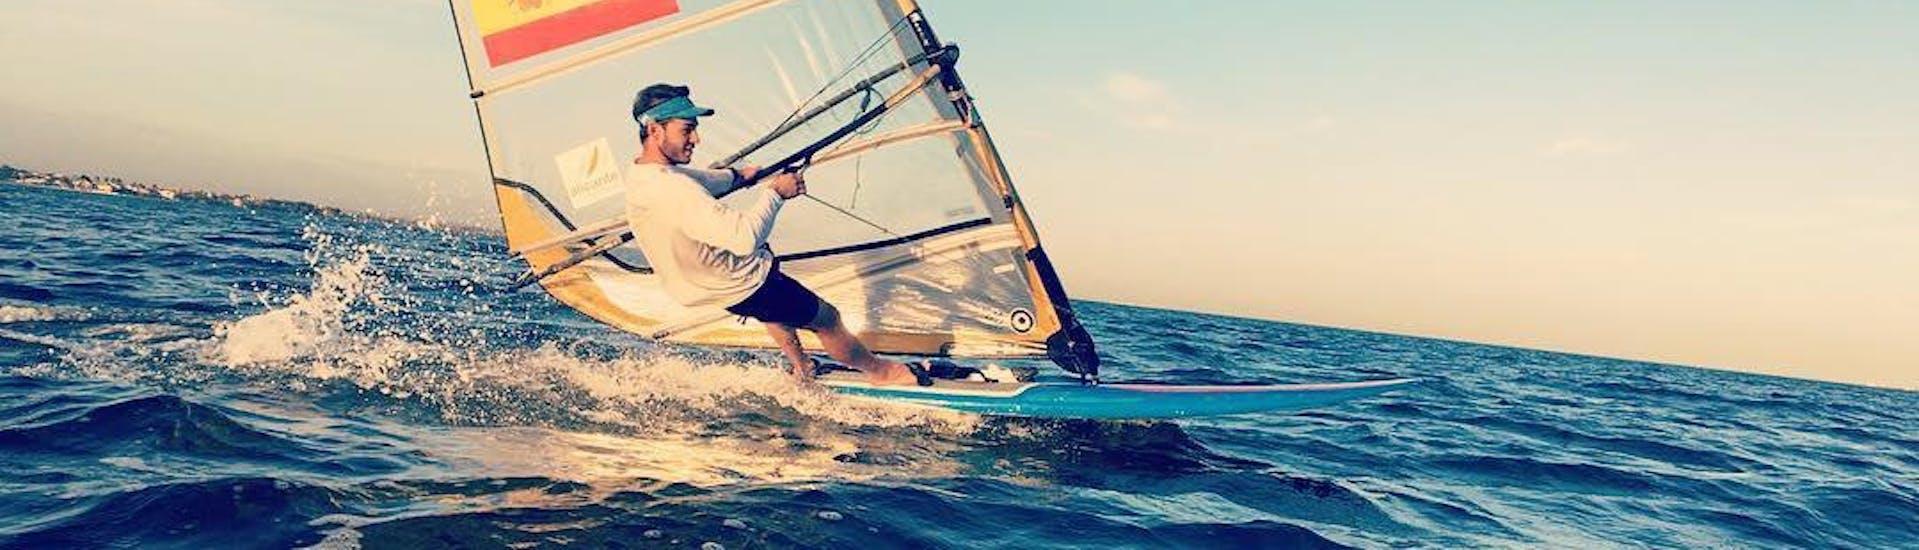 private-windsurfing-lessons-in-valencia---beginner-hero-1